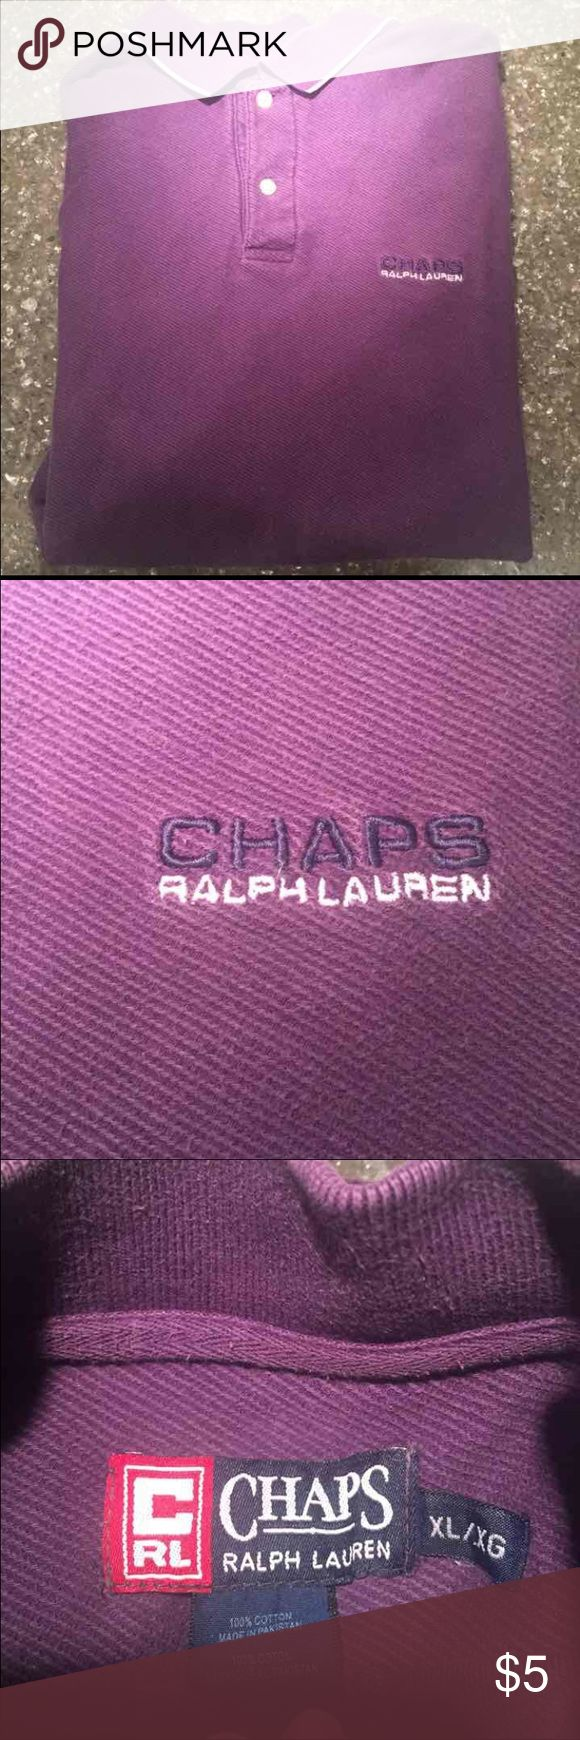 Purple Chaps Ralph Lauren Golf Shirt XL Shows signs of wear: fading, etc. still very wearable Chaps Shirts Casual Button Down Shirts